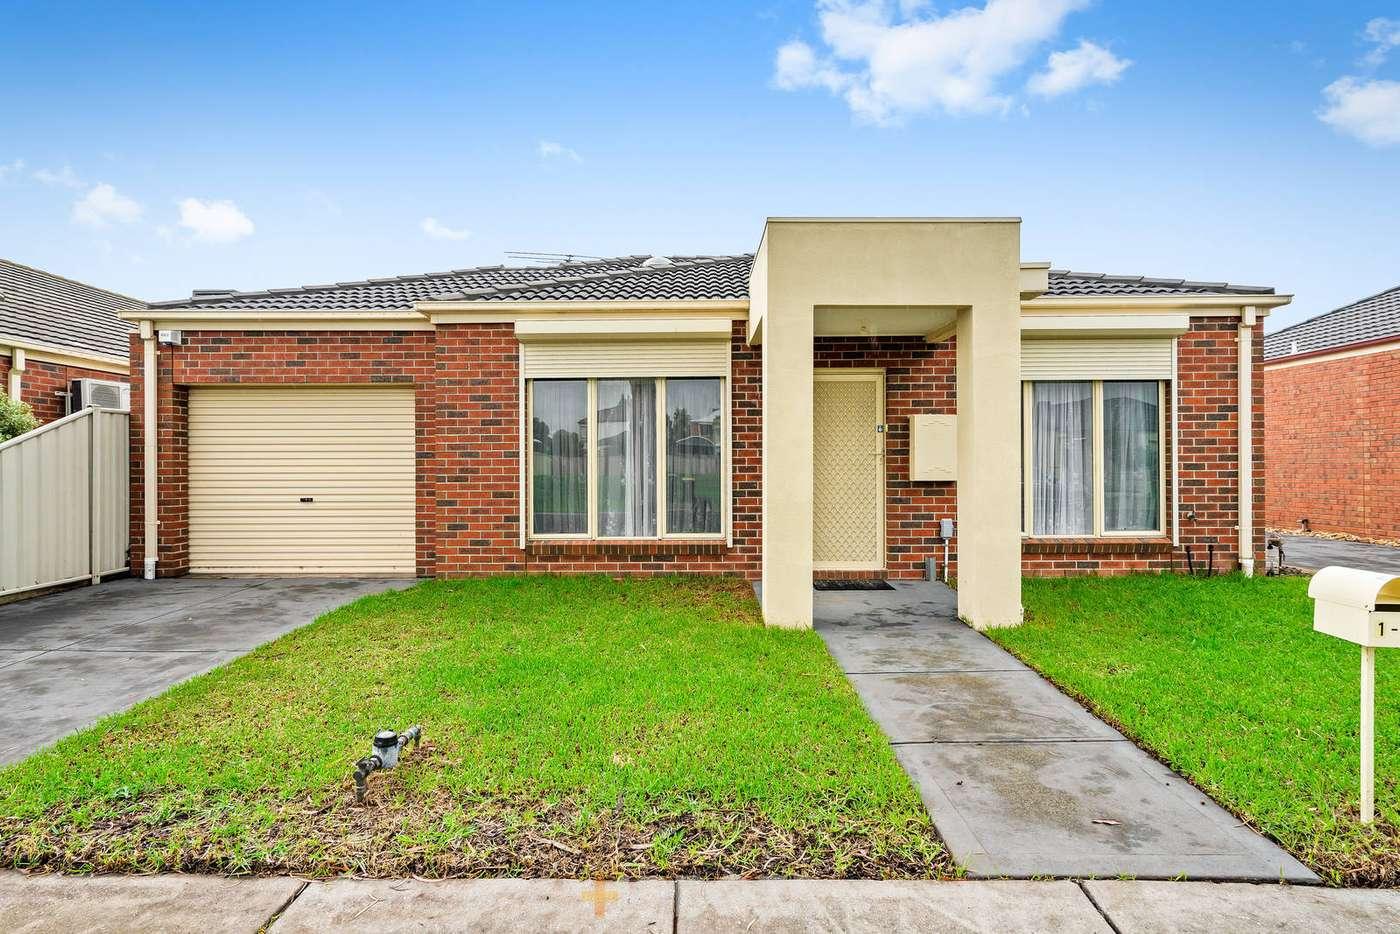 Main view of Homely house listing, 1/14 Jordyn Street, Tarneit VIC 3029